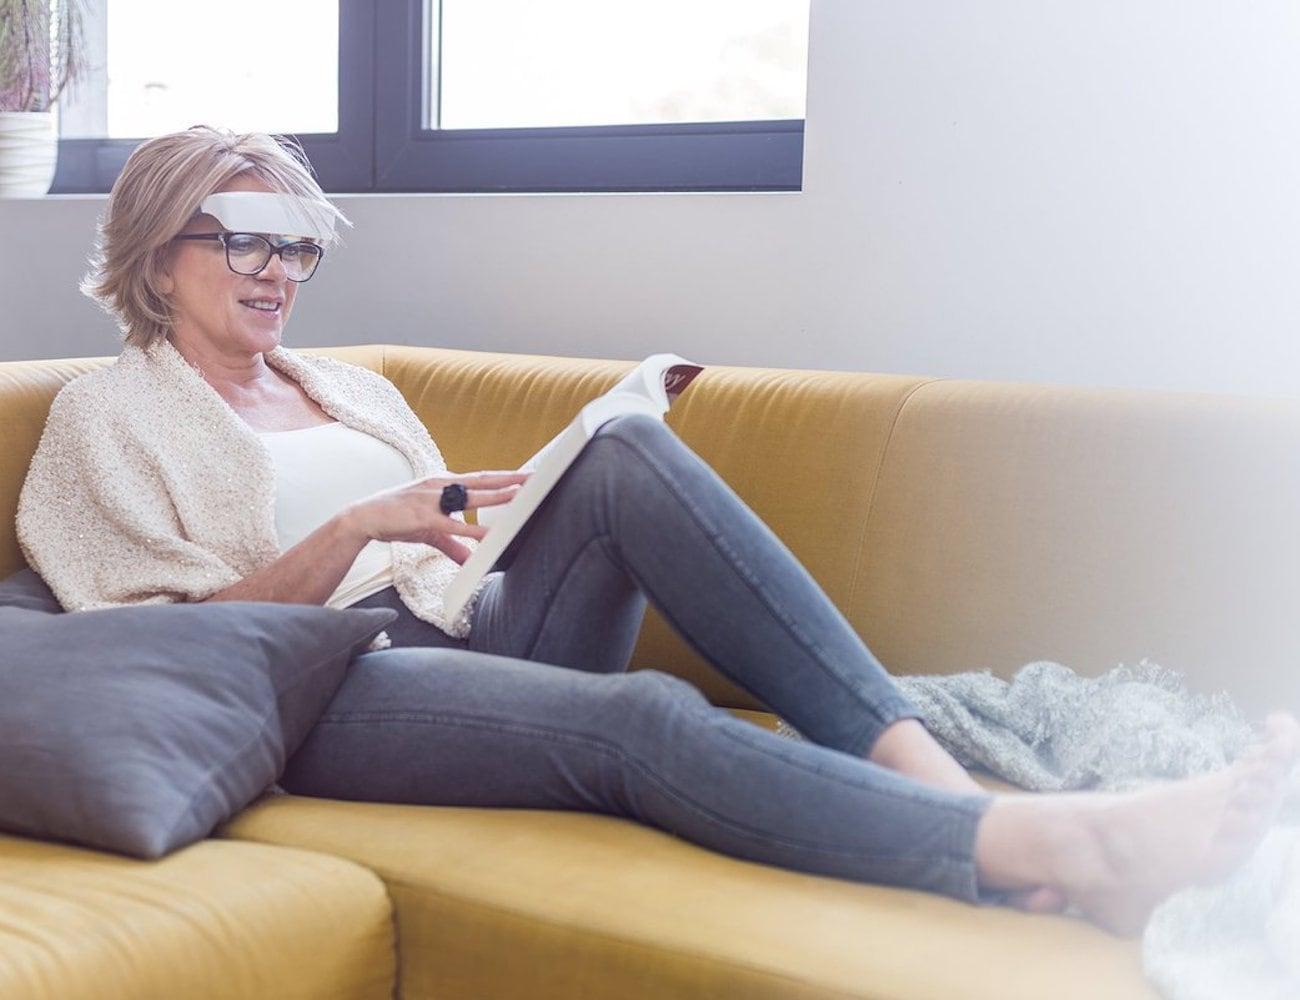 Luminette 2 Bright Light Therapy Glasses